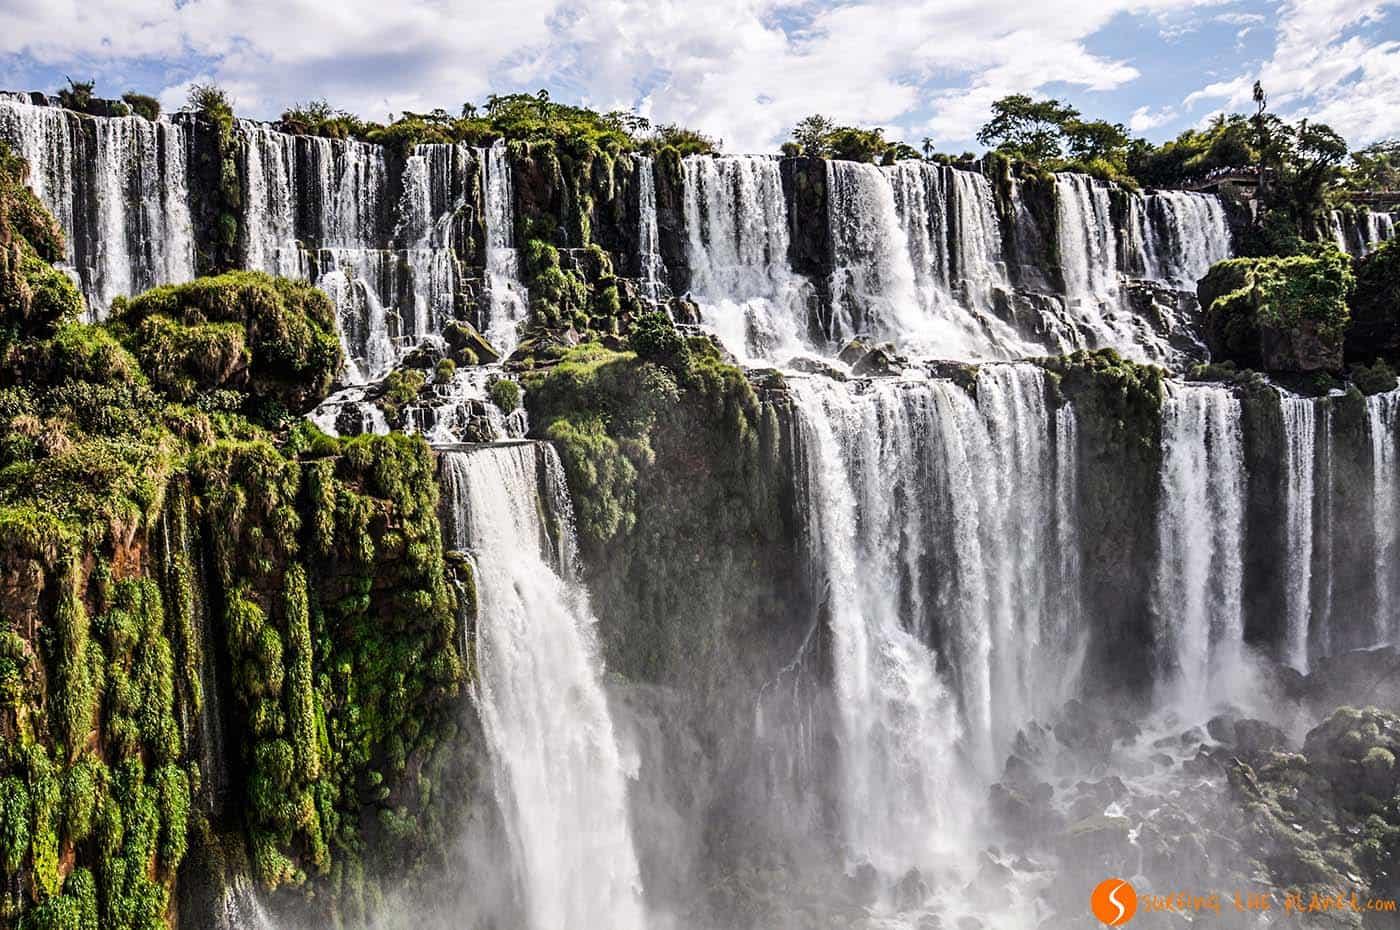 Panotama delle cascate di iguazù Argentina